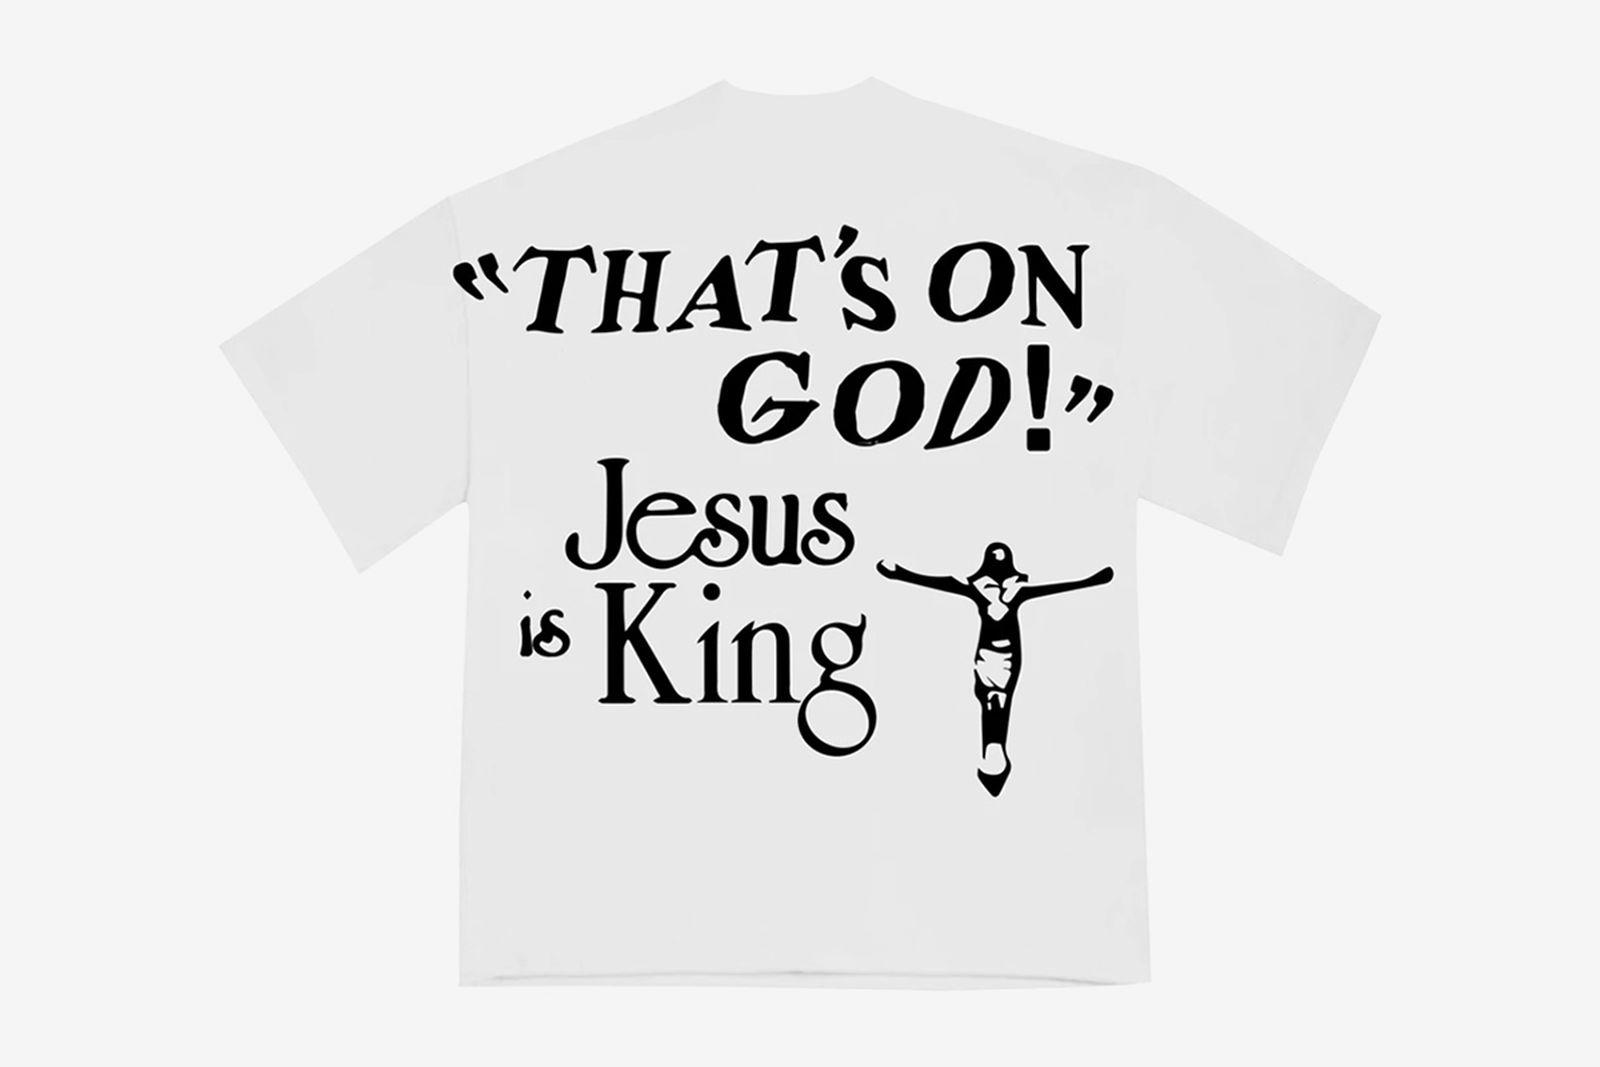 Kanye West Cactus Jack Flea Market Jesus Is King merch